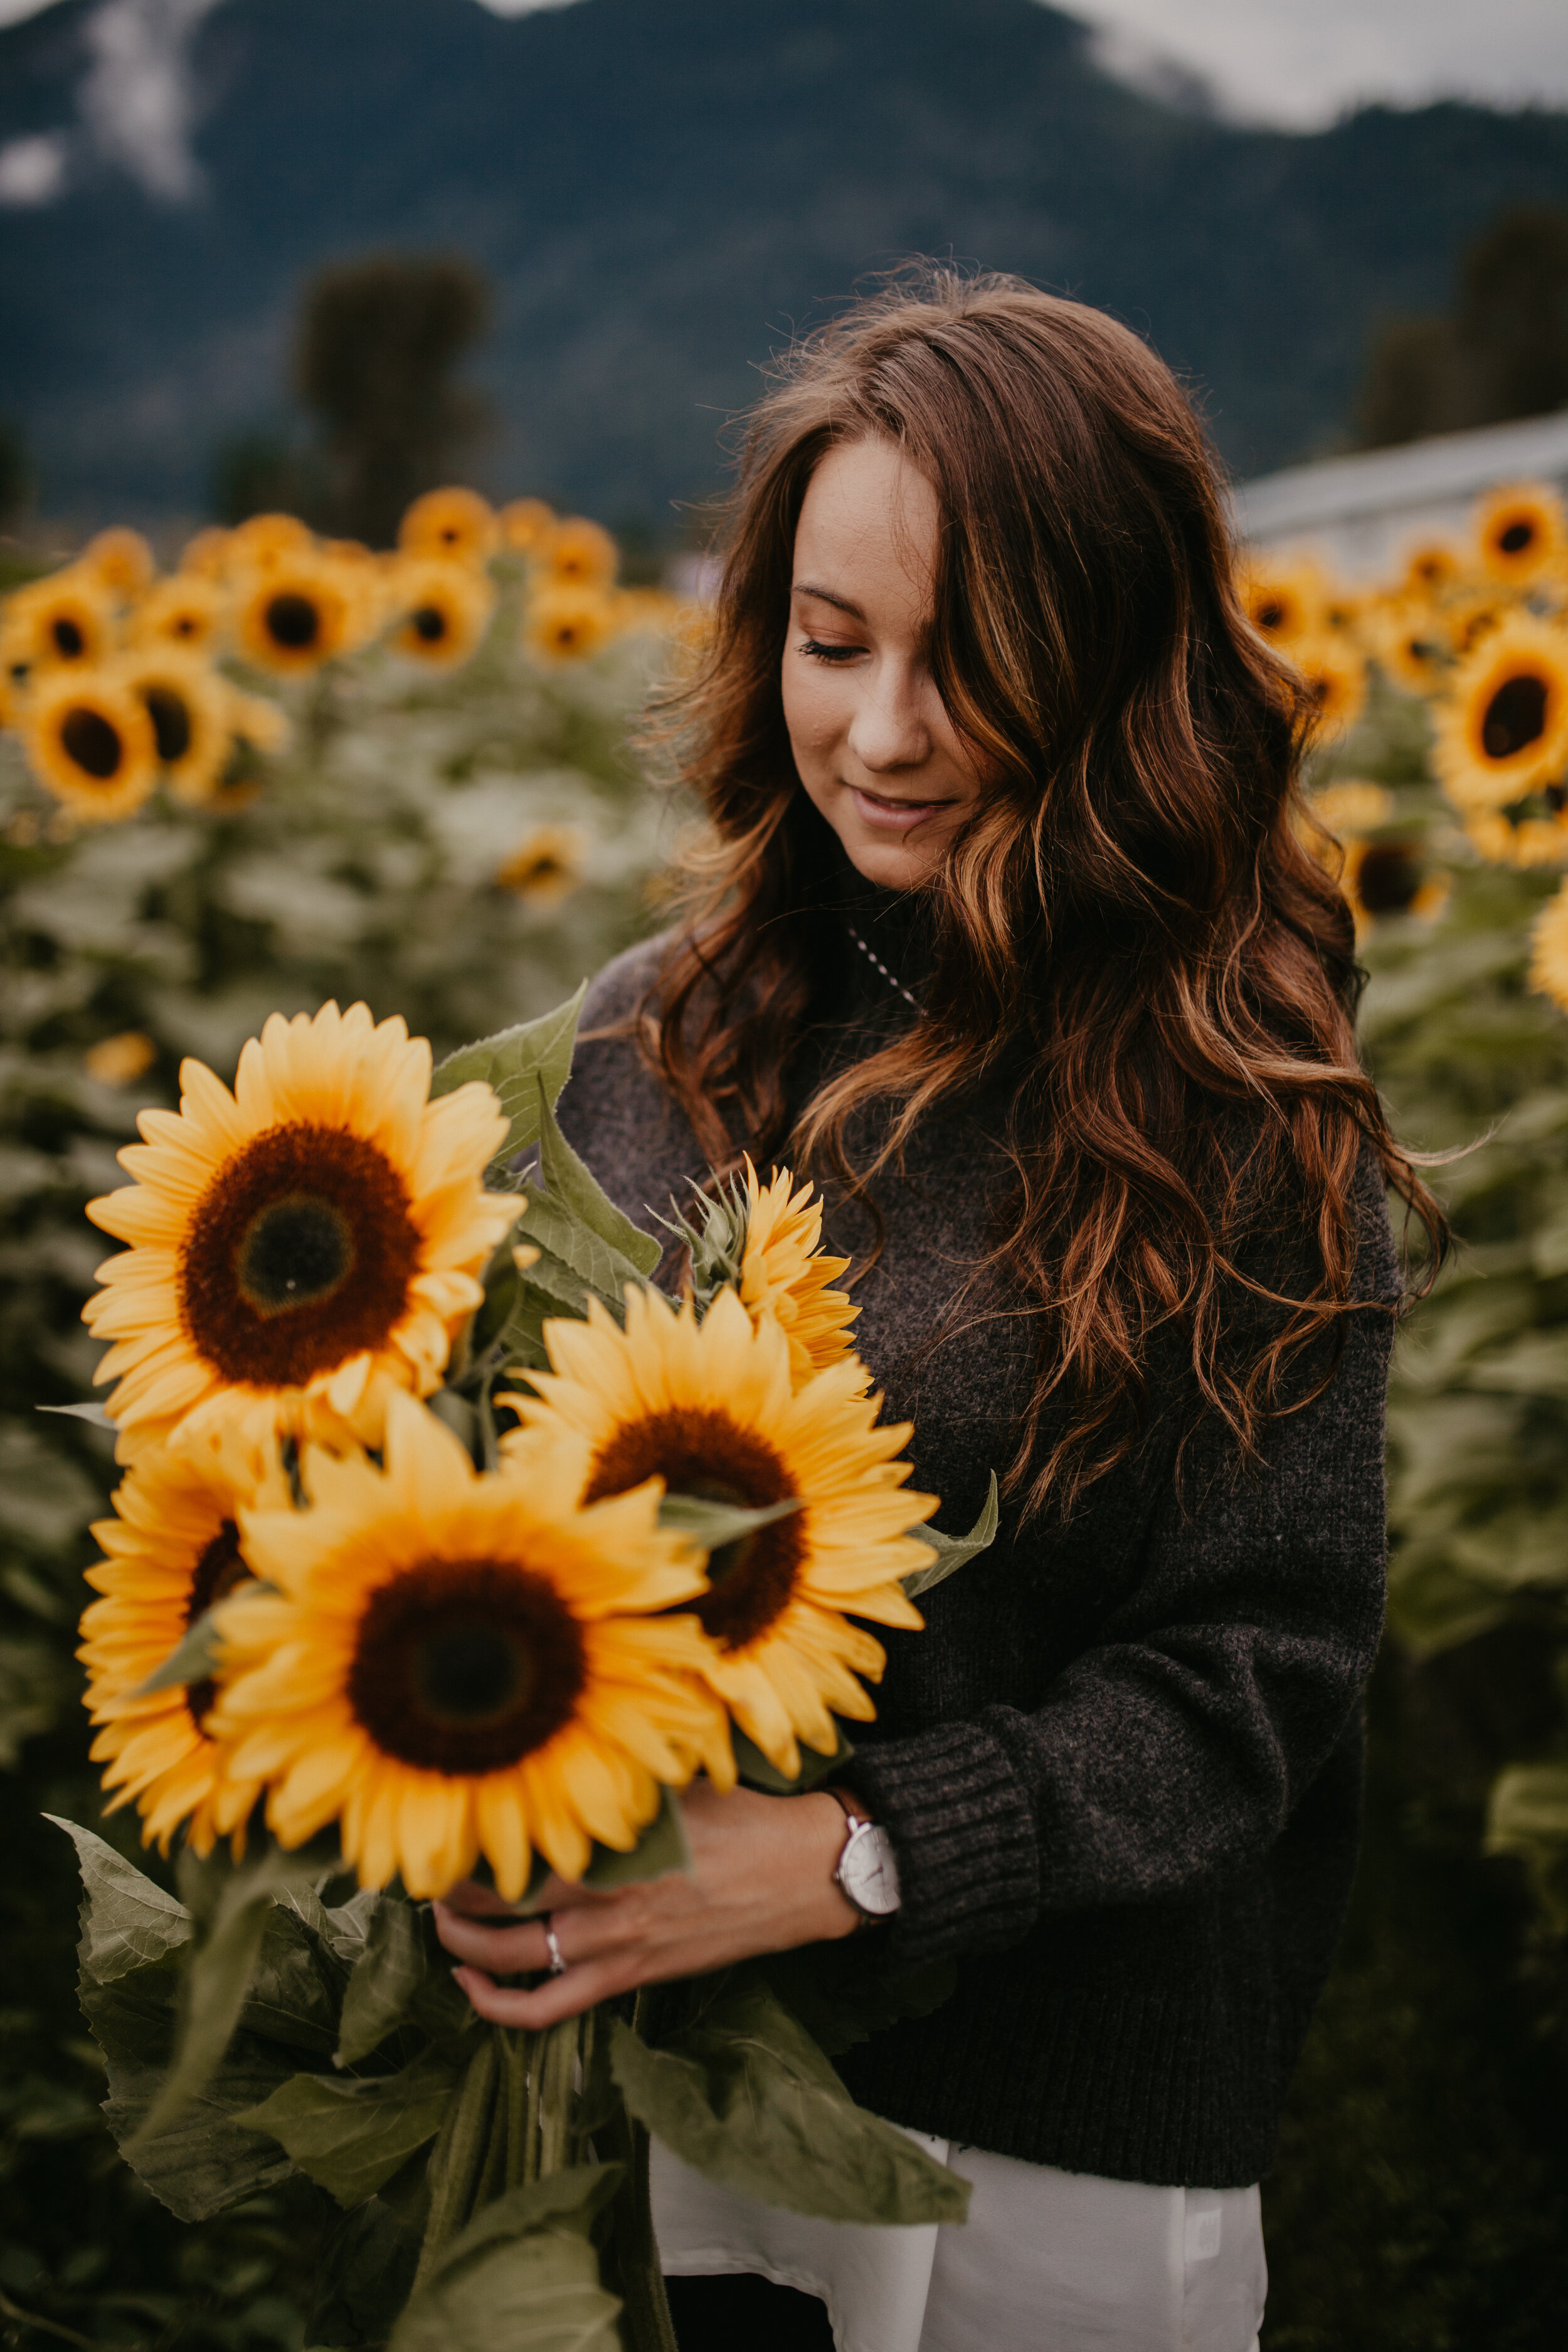 SunflowerFestival-34.jpg